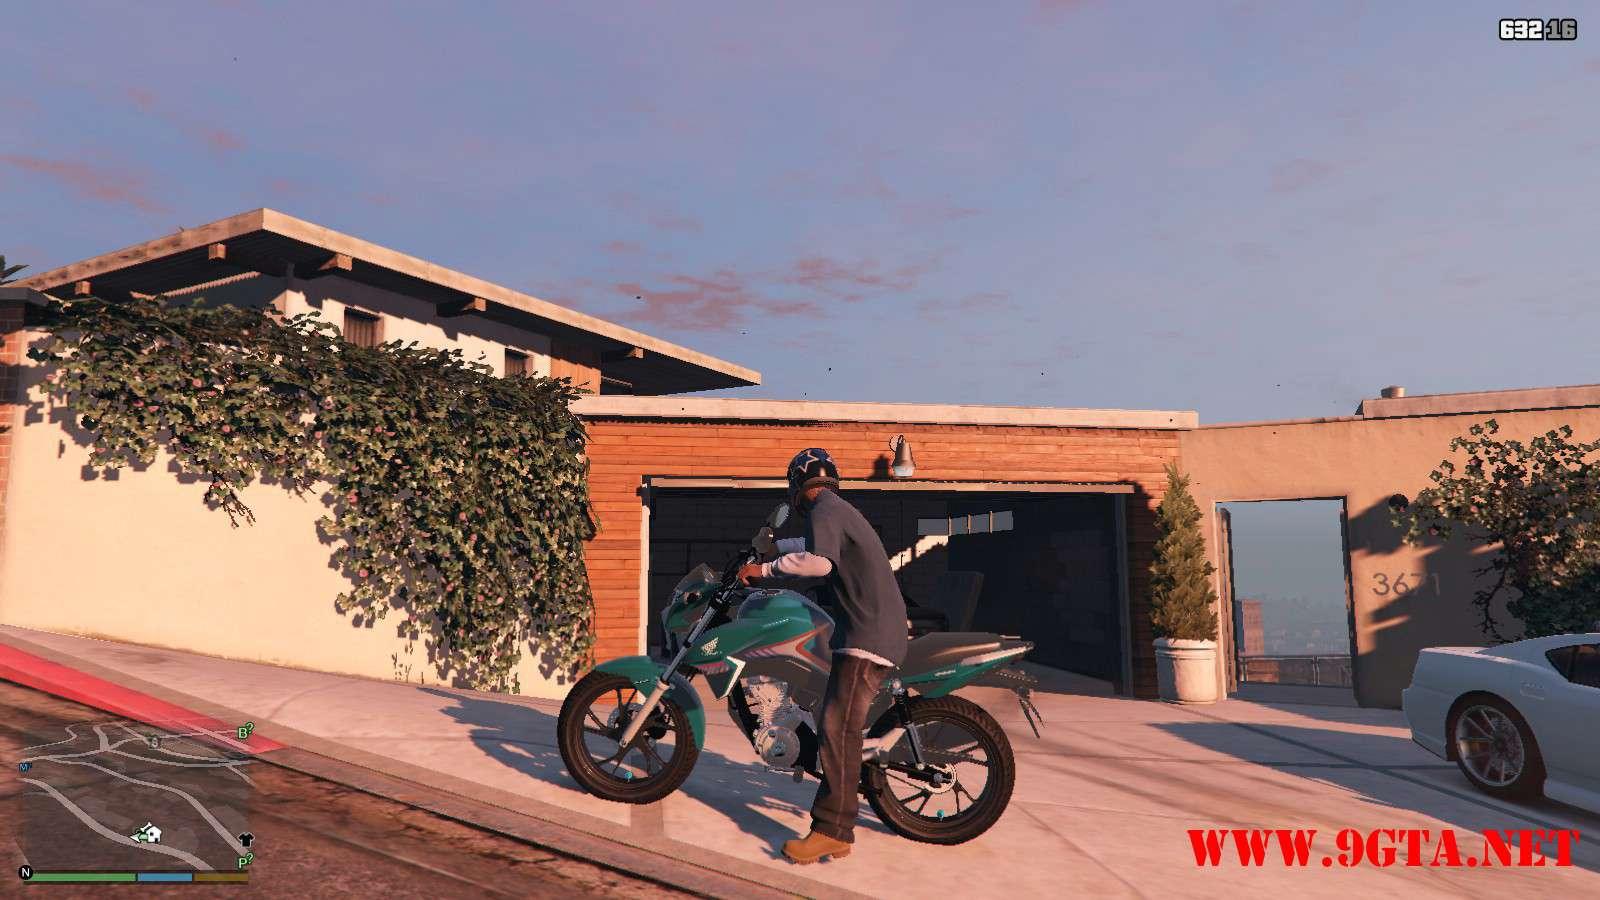 2016 Titan 160 Motocycle GTA5 Mods (2)